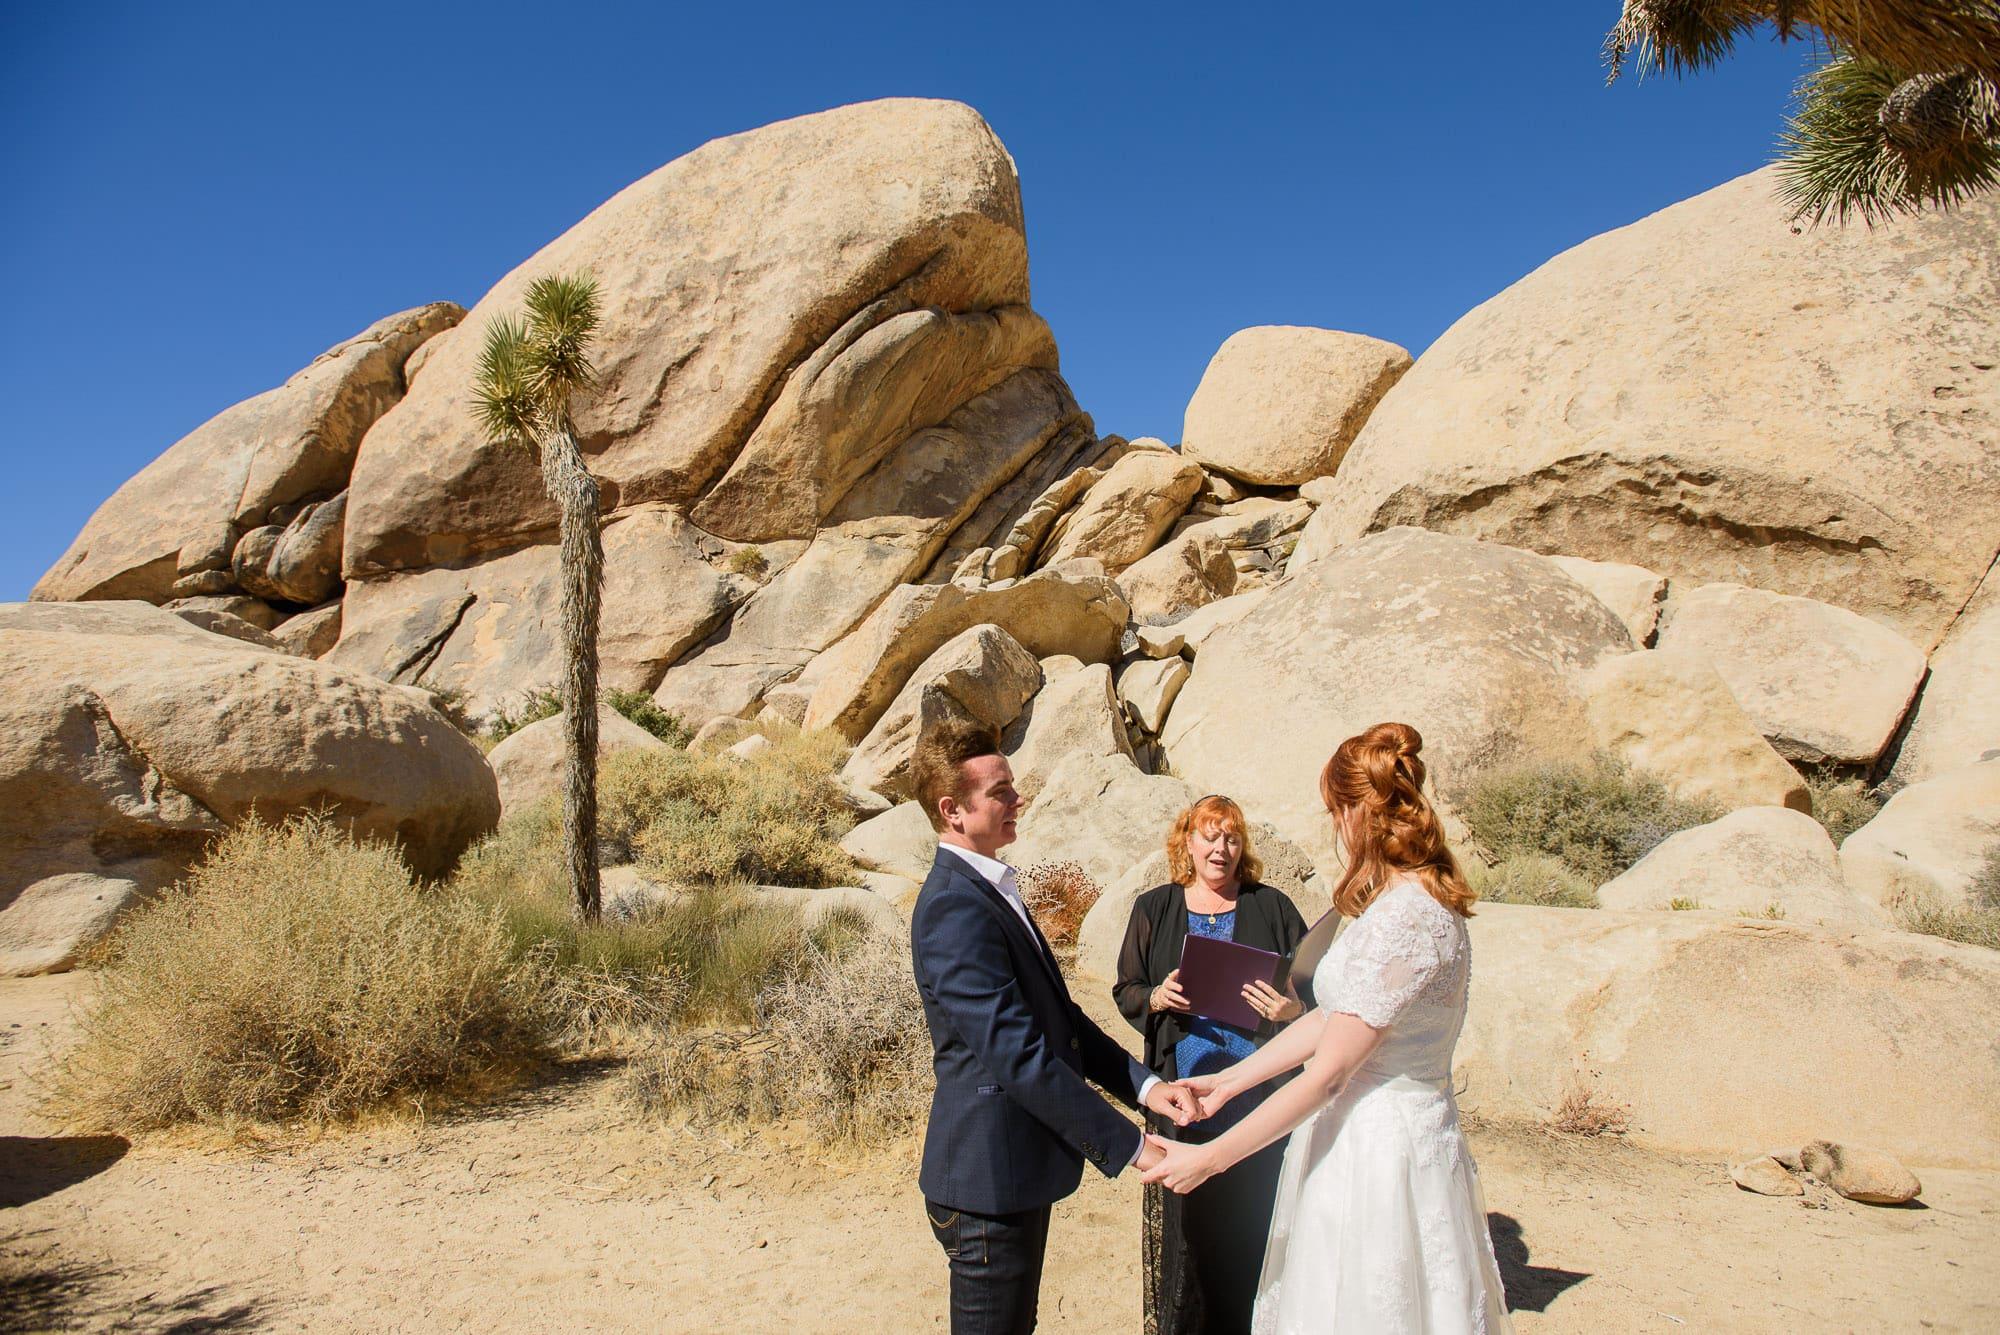 004_Alan_and_Heidi_Joshua_Tree_Destination_Wedding